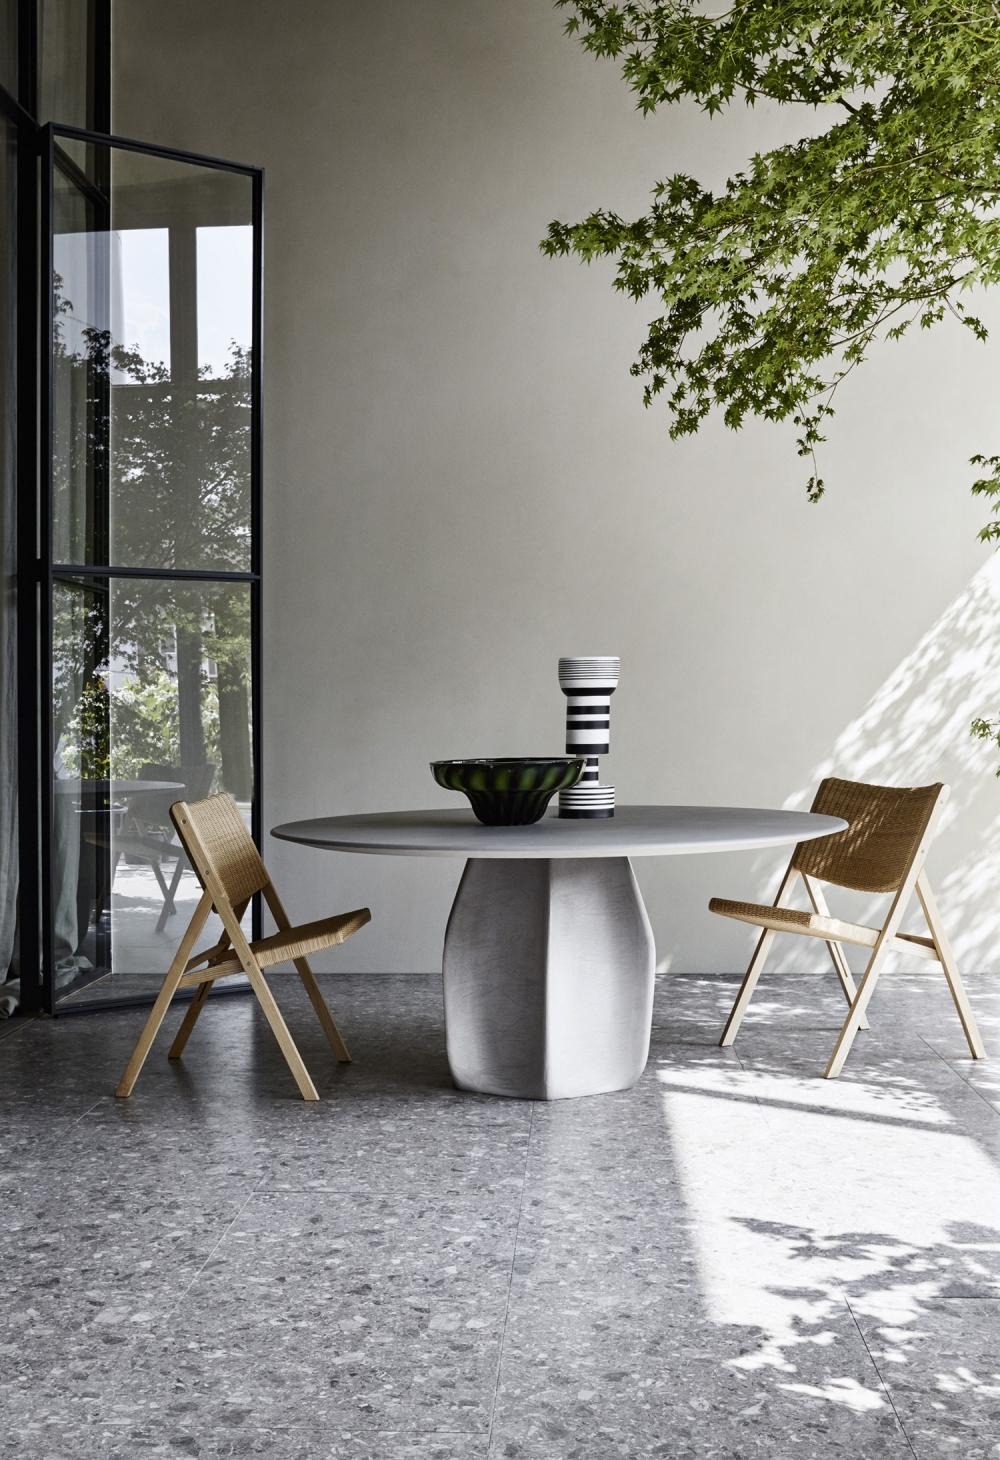 Asterias design par Patricia Urquiola